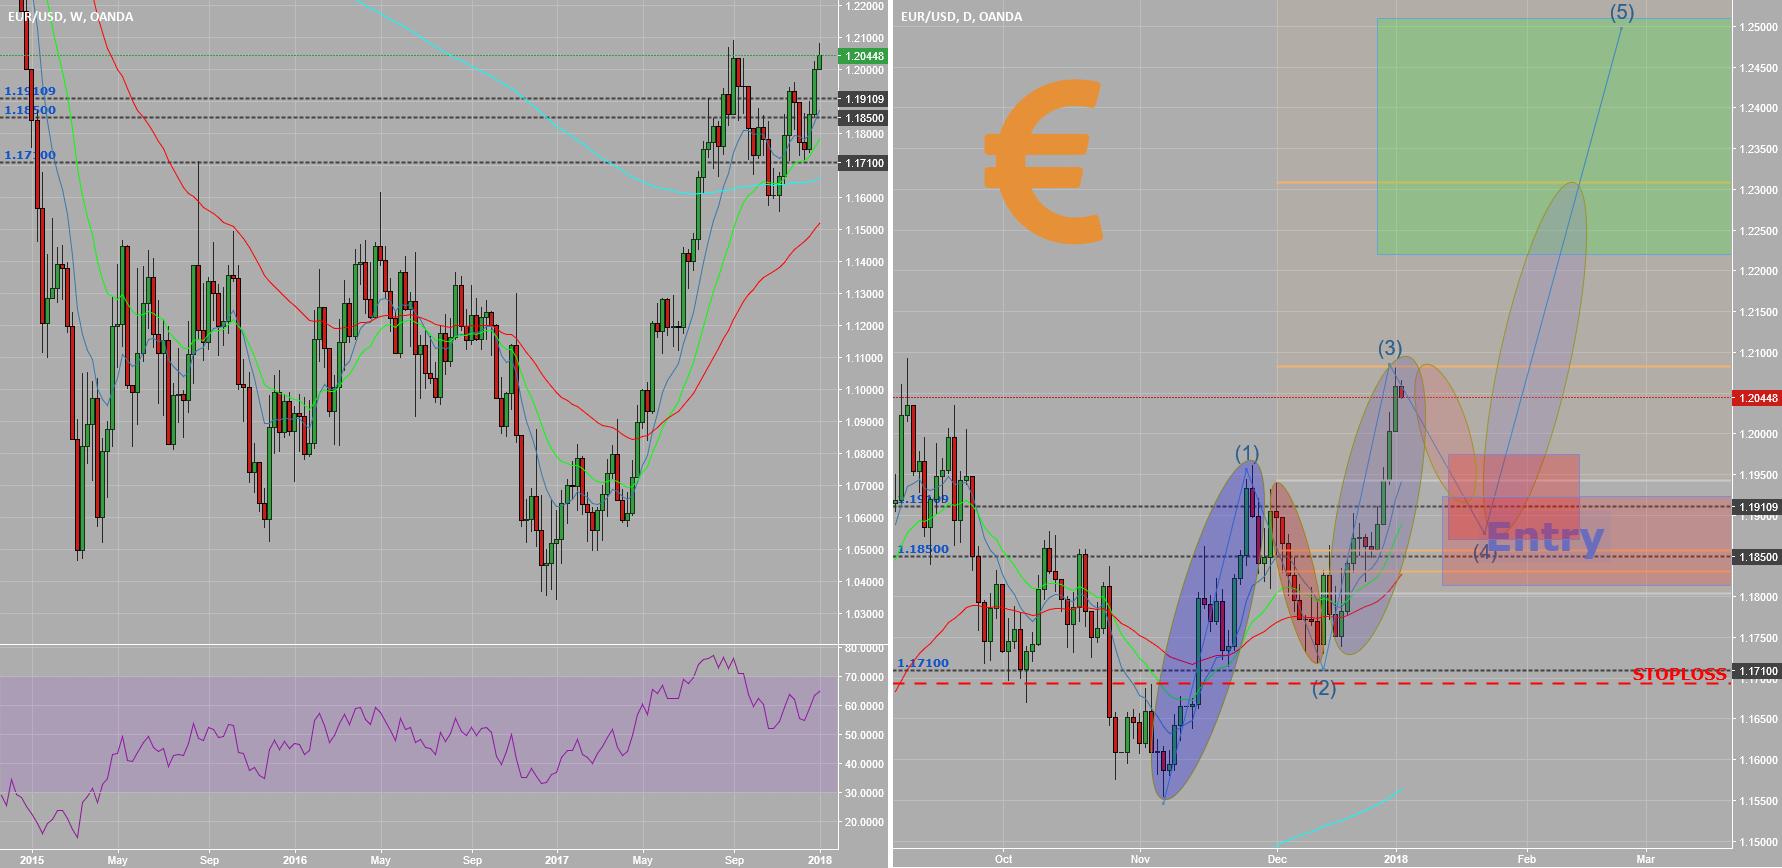 EURUSD Wave and Fib Analysis -insightful. Newish highs expected.